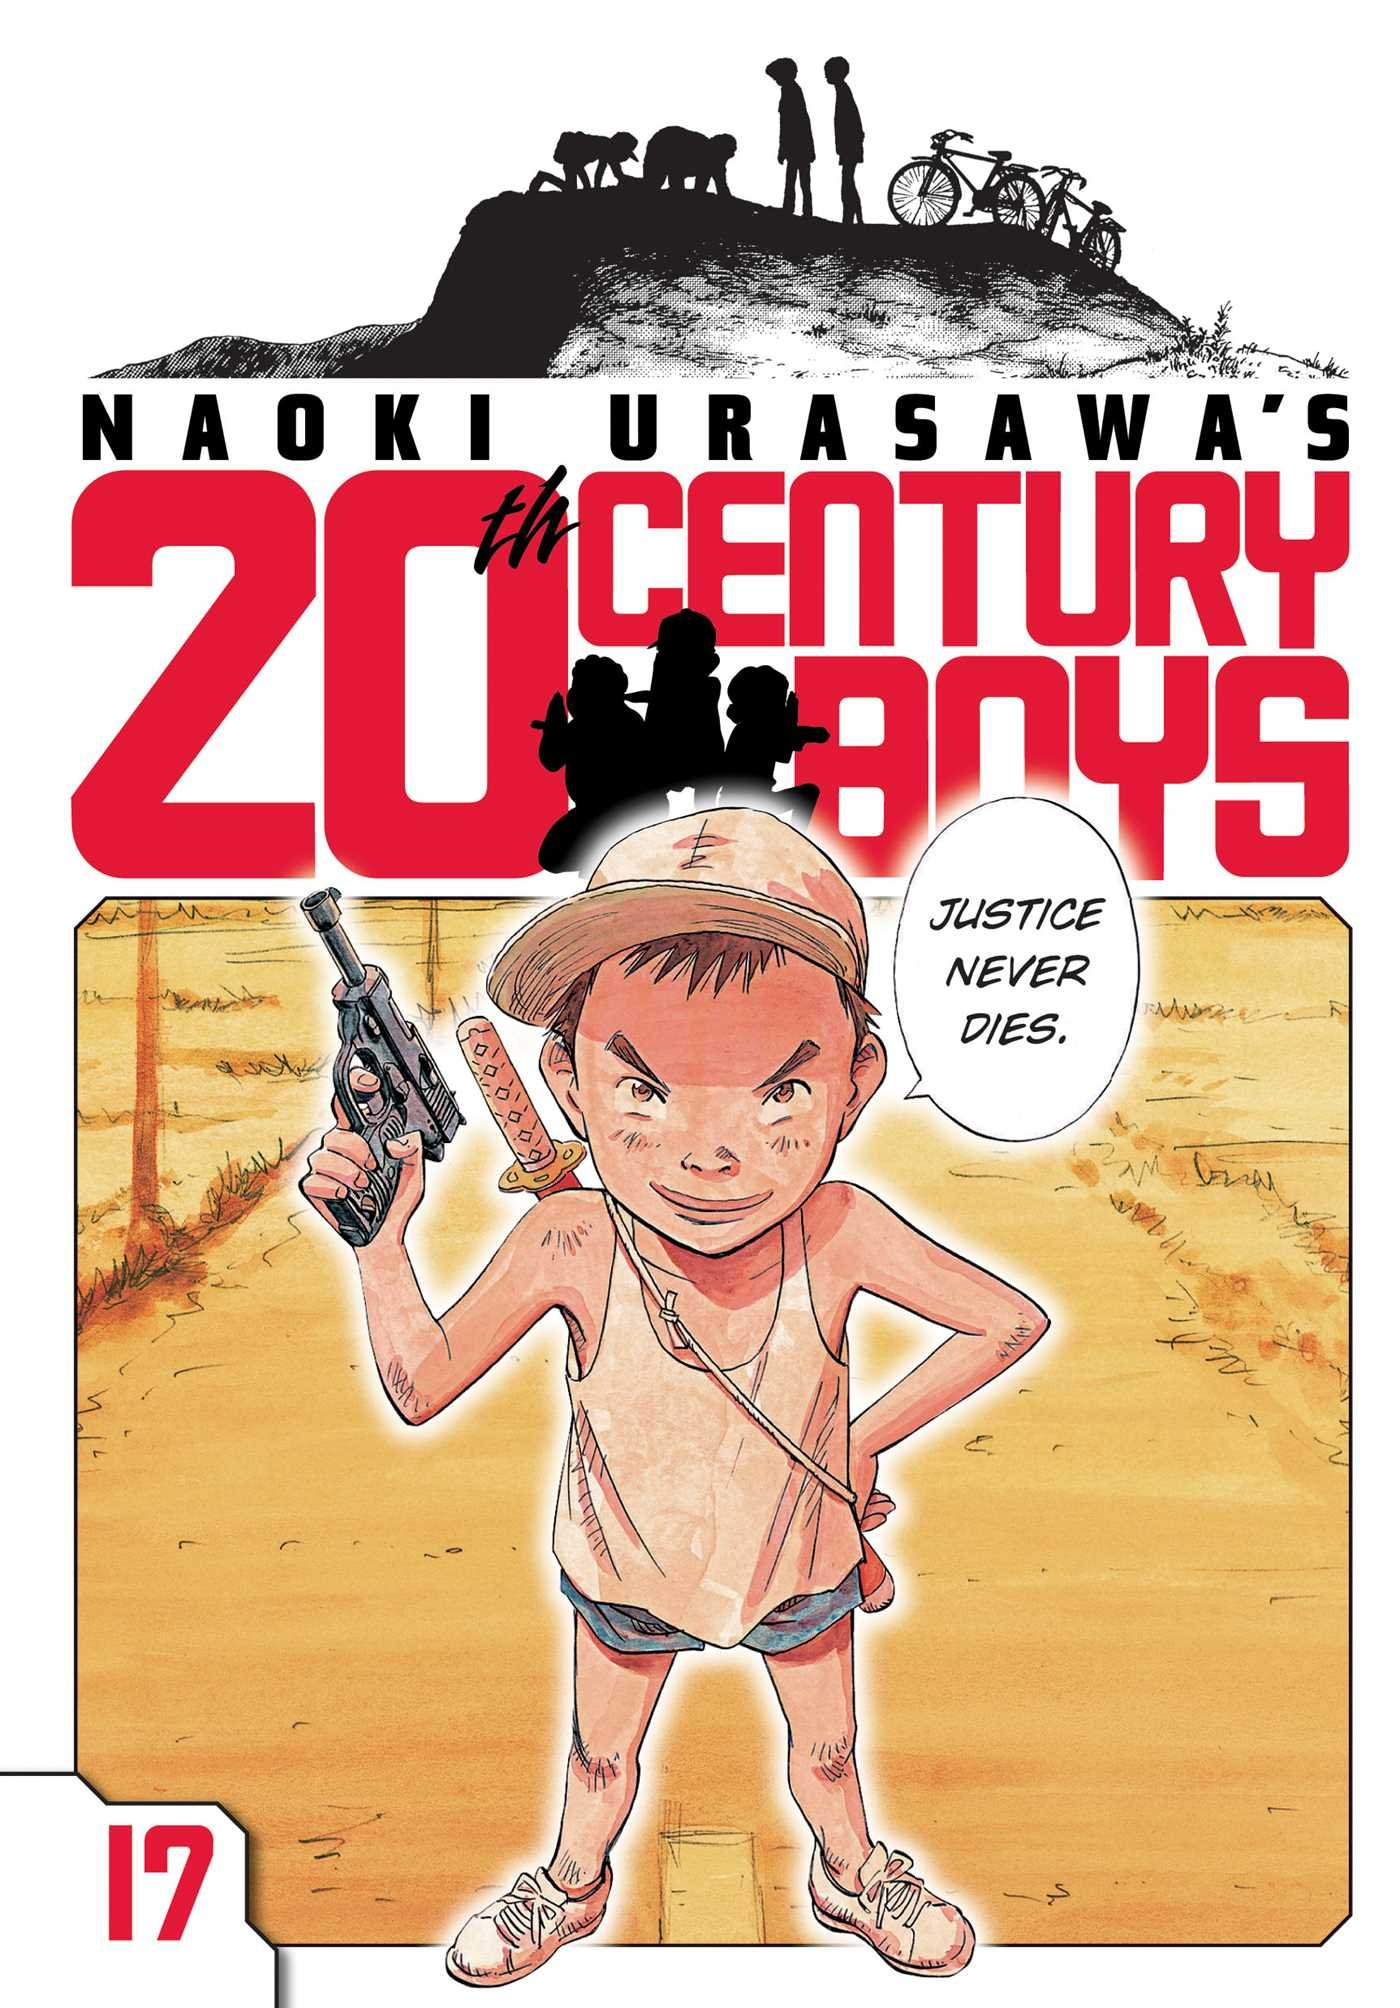 NAOKI URASAWA 20TH CENTURY BOYS GN VOL 17 (C: 1-0-1) (Naoki Urasawa's 20th Century Boys, Band 17)